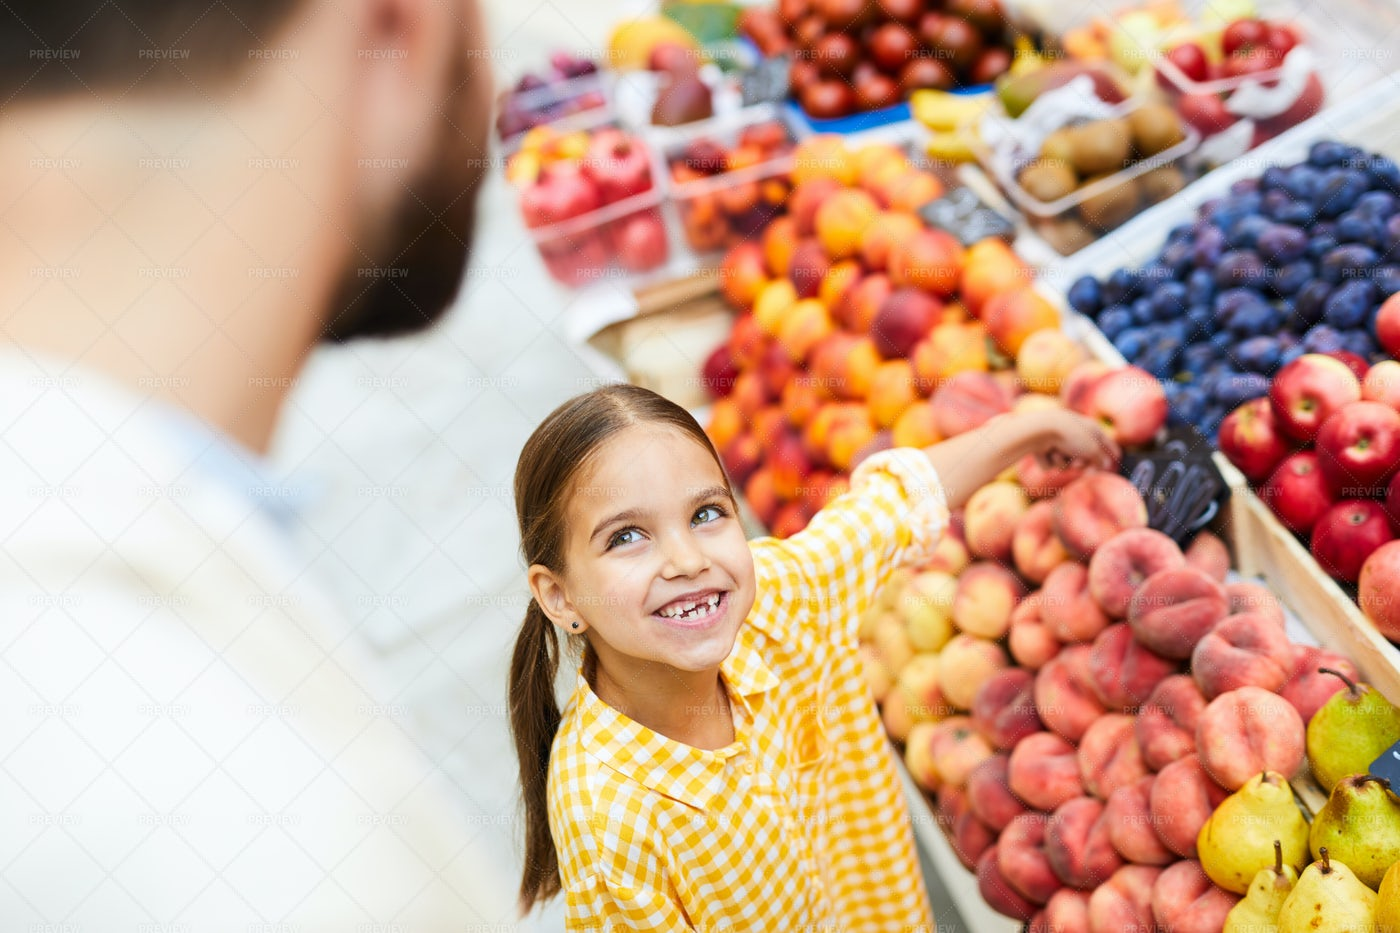 Happy Daughter Wanting Fruits: Stock Photos